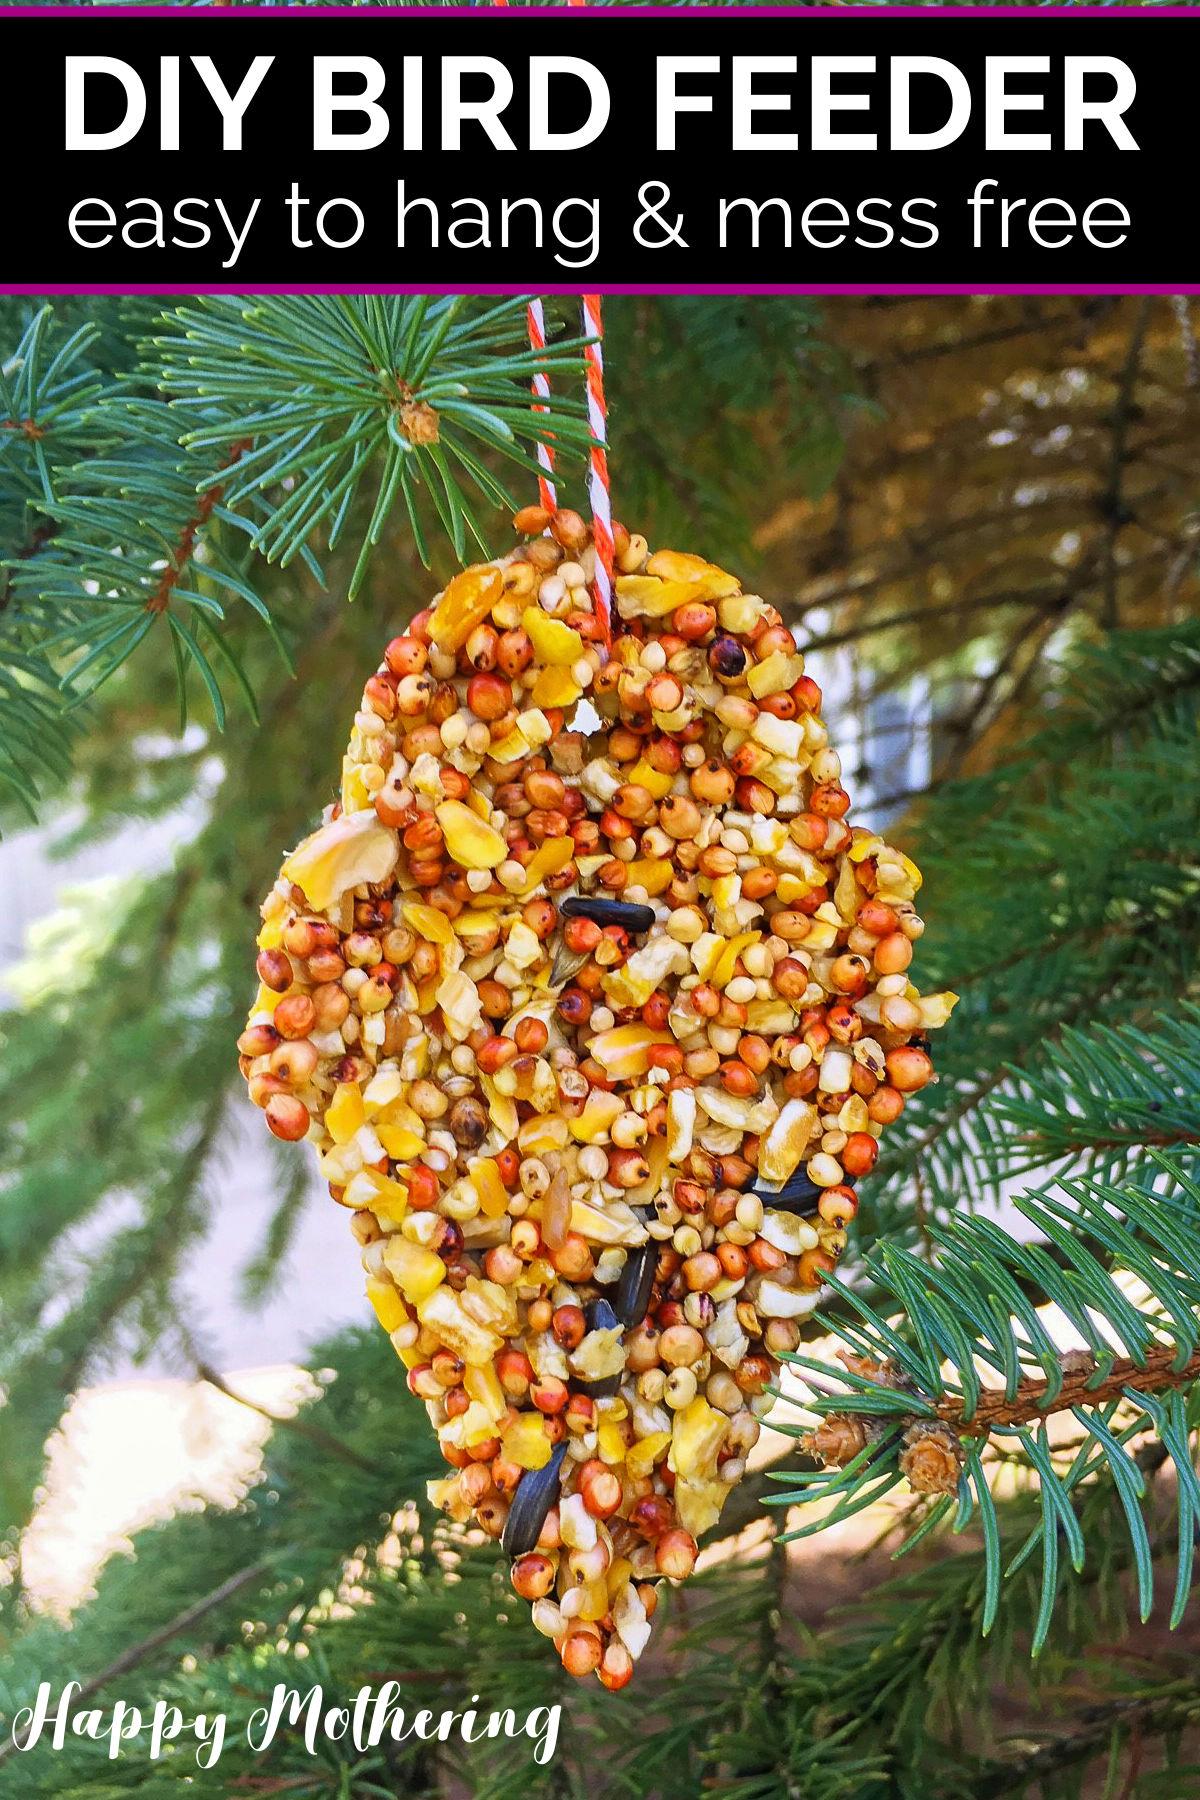 DIY birdseed bird feeder hanging from a pine tree